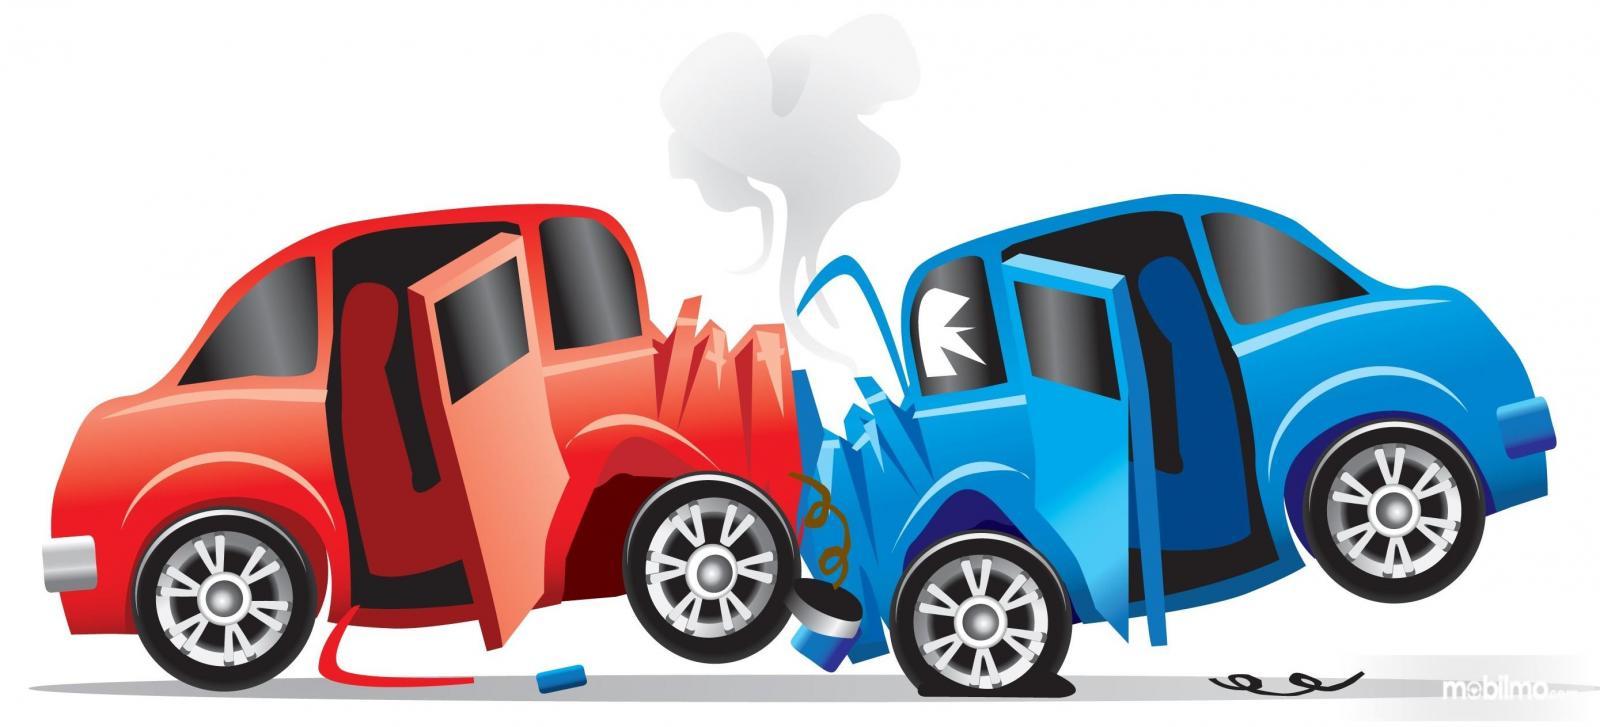 Gambar Ilustrasi mobil tabrakan